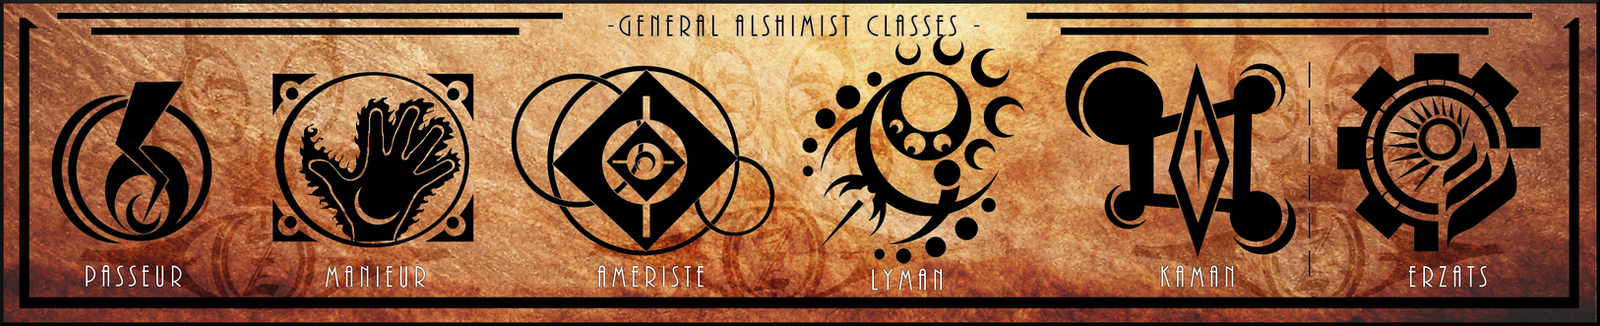 [MC] General Alshimist Classes by Zephirice